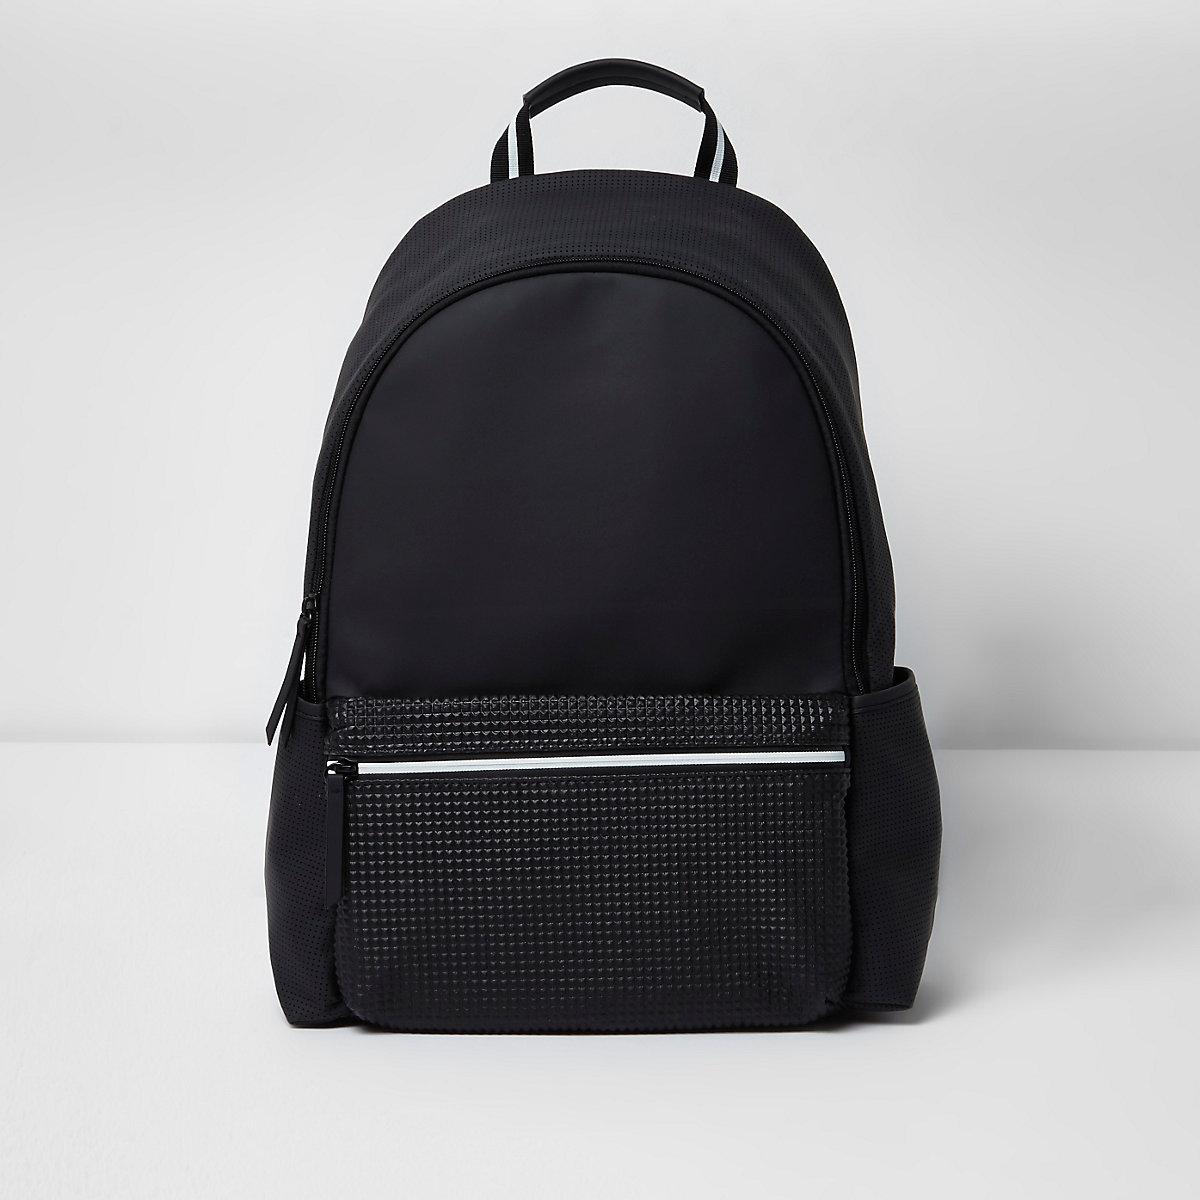 9e8c6913941a Black textured pocket backpack - Backpacks   Rucksacks - Bags - men